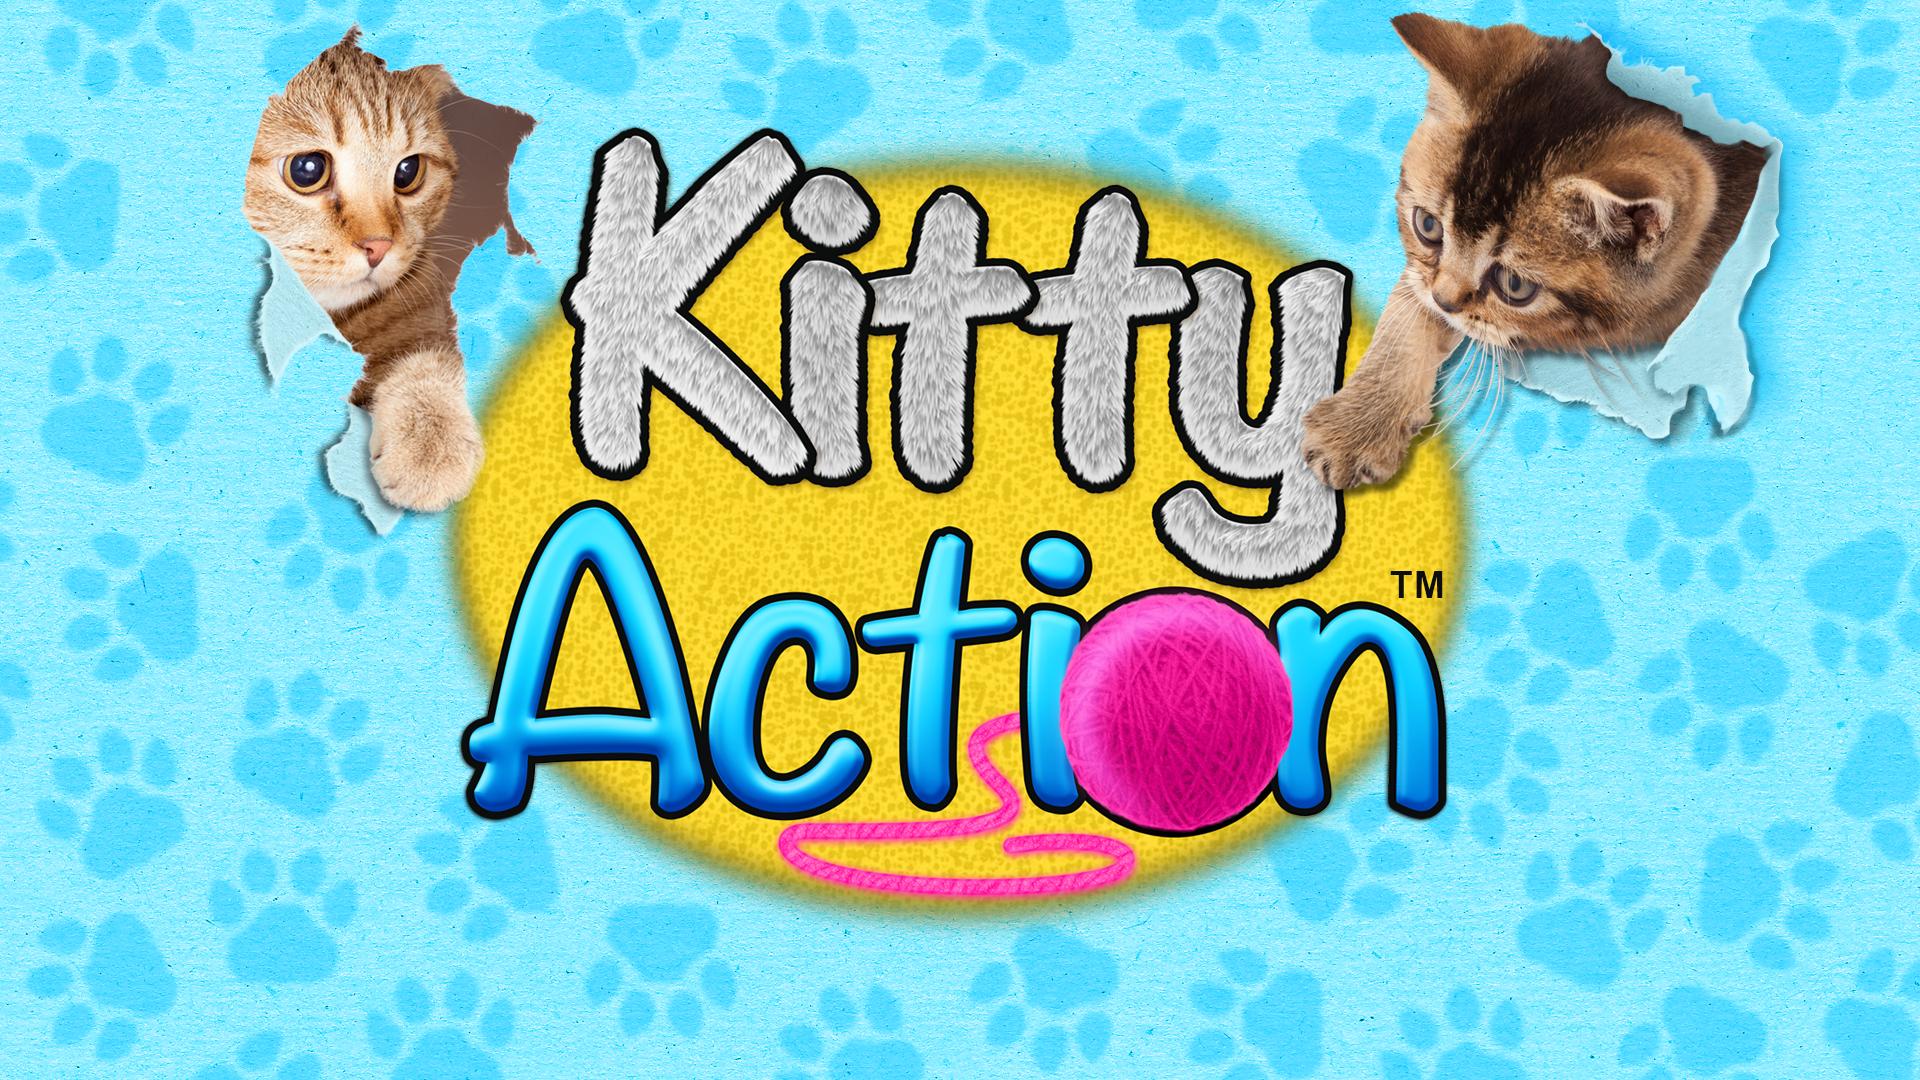 splash_screen_kitty_action.png